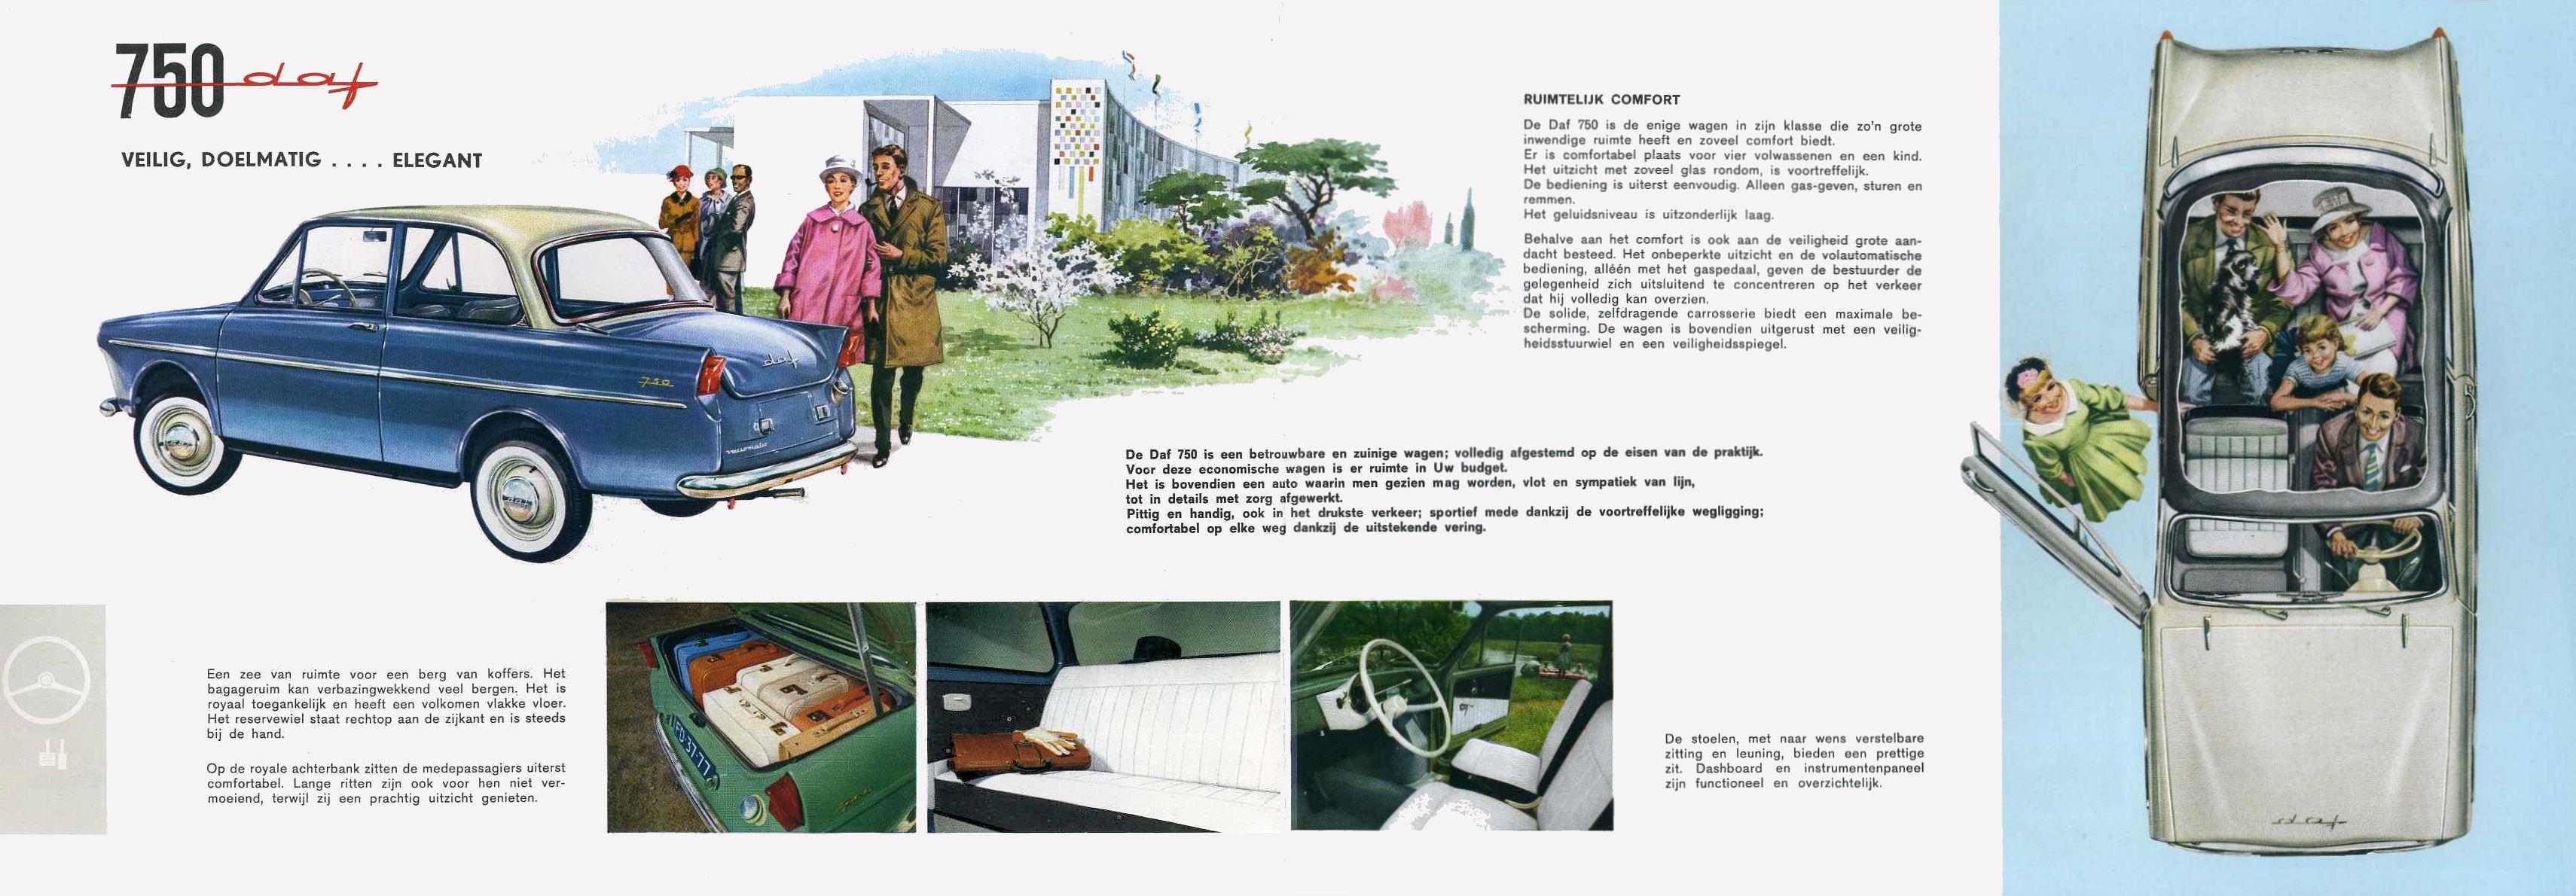 1961 daf 750 brochure